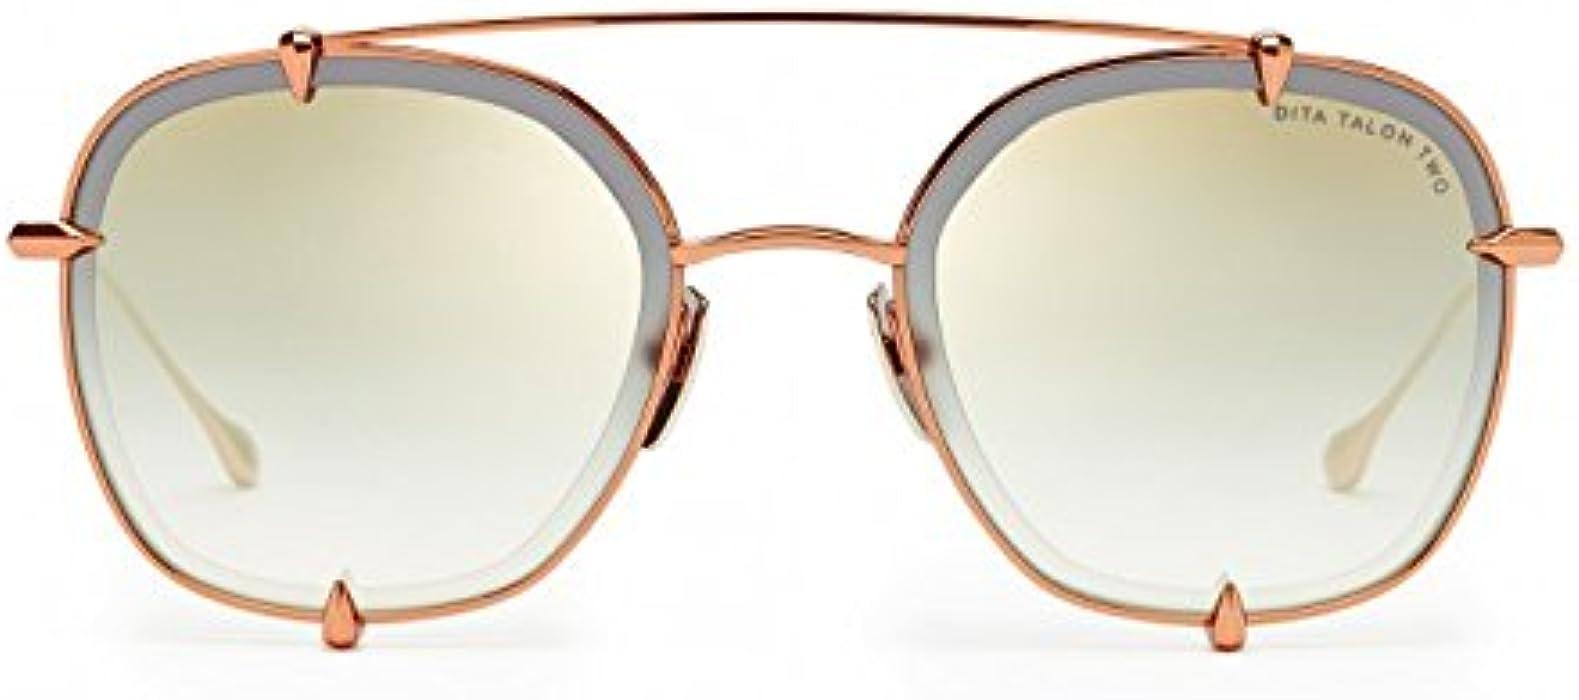 180fa178437 DITA Luxury Eyewear Sunglasses Talon-two 23009-B-RGD-54 Rose Gold ...